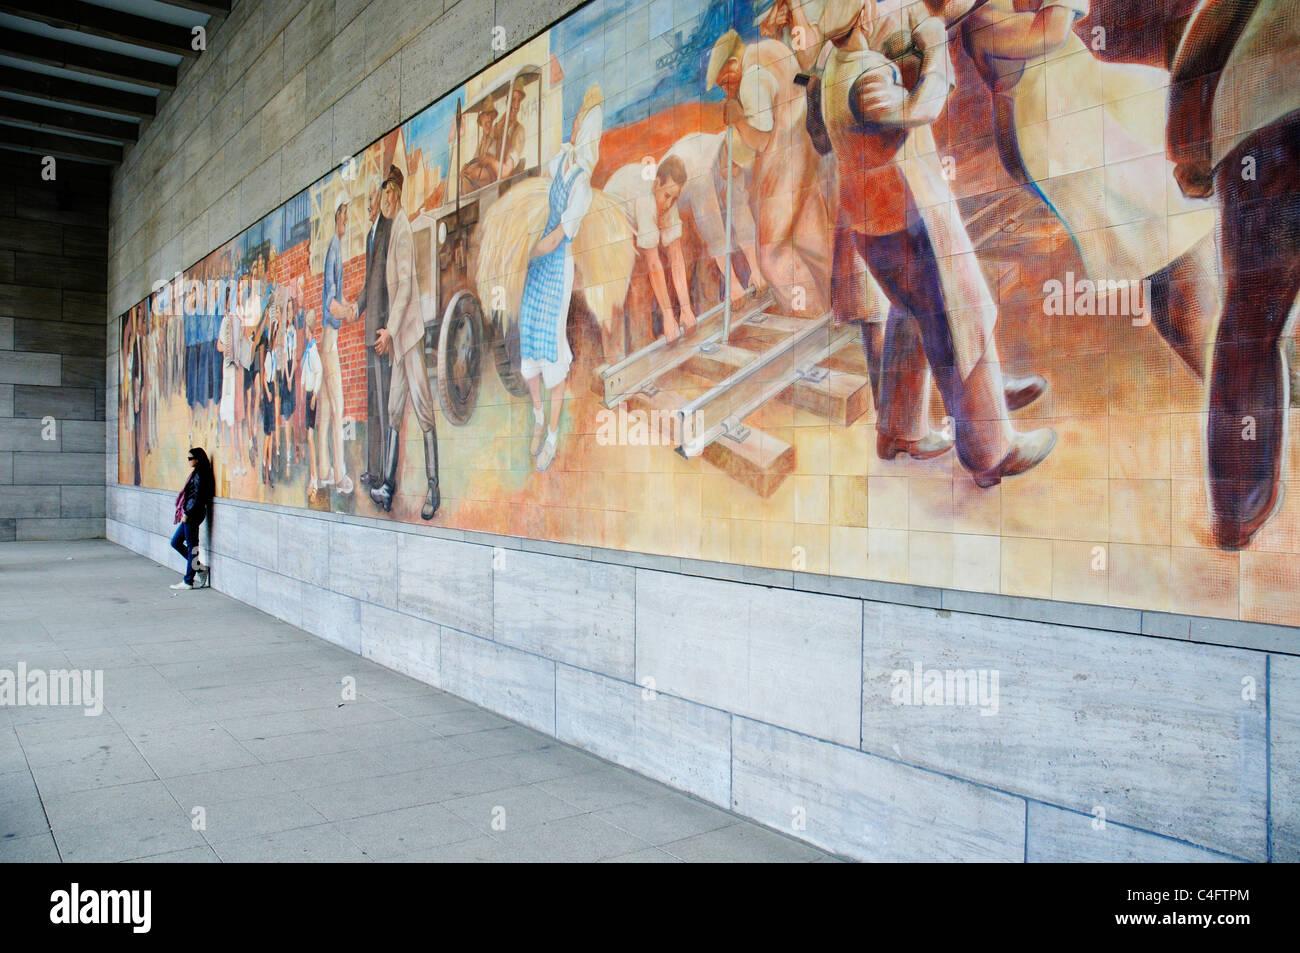 berlin wall mural stock photos u0026 berlin wall mural stock images